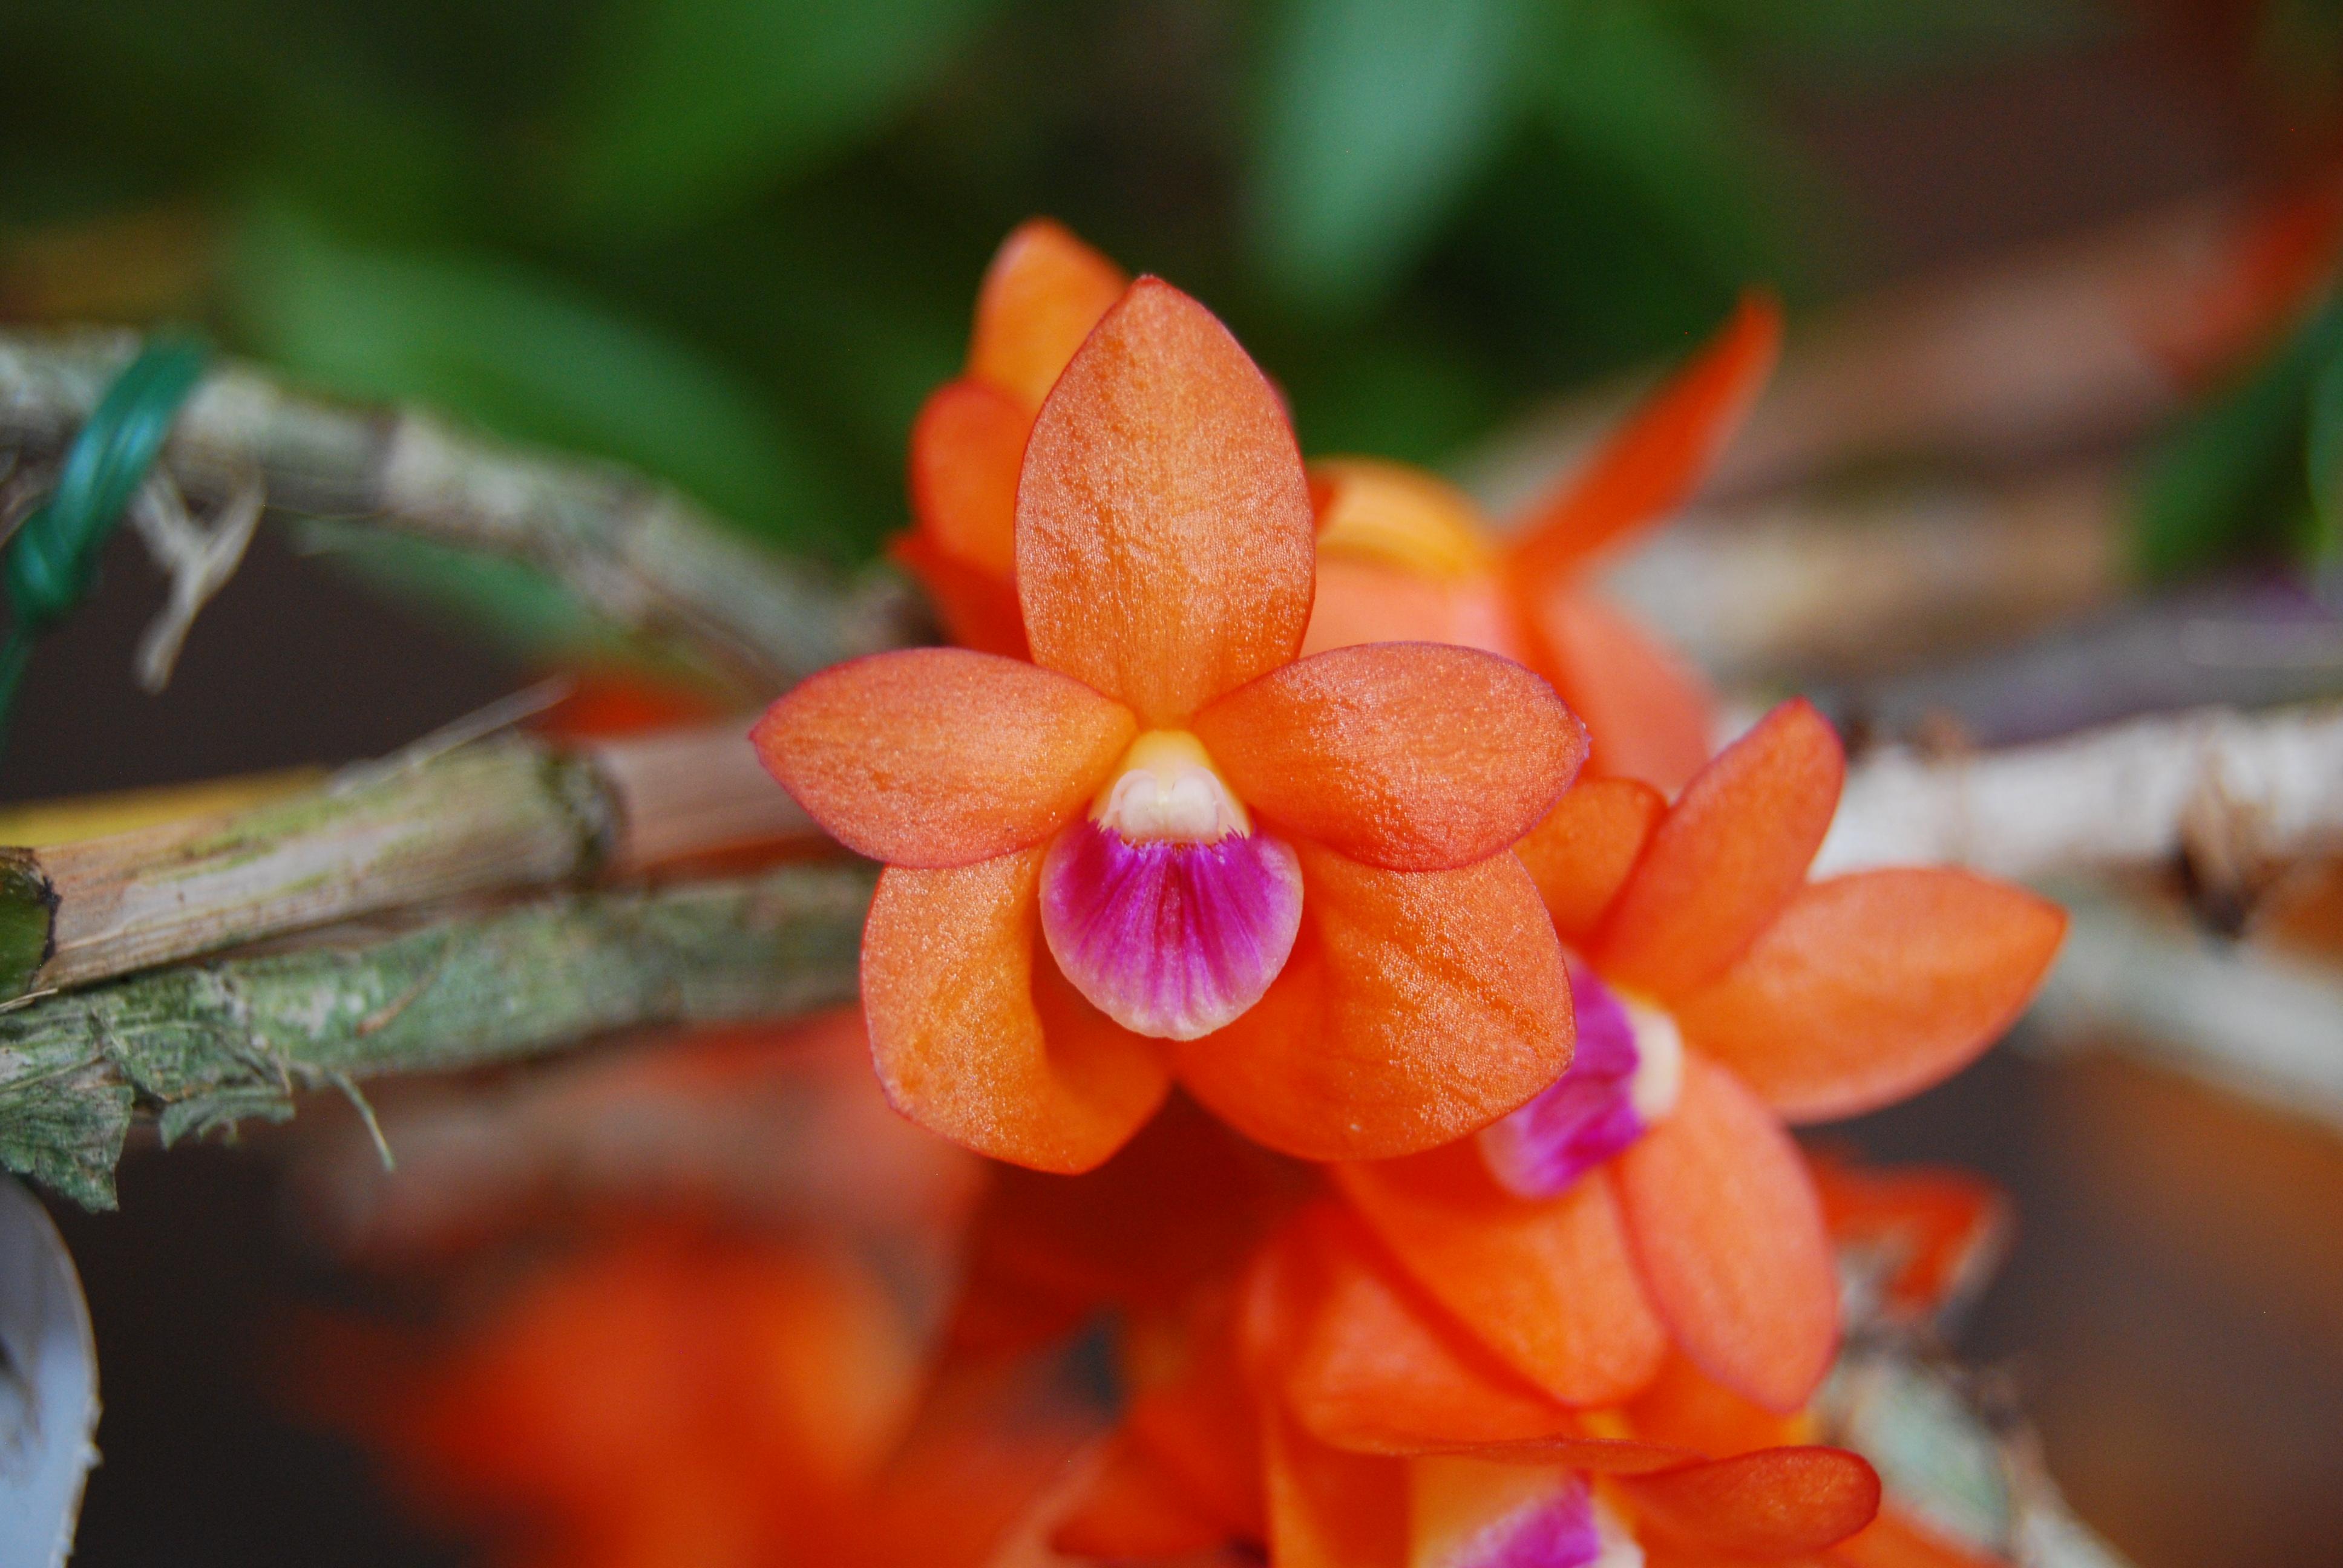 2016-060 Den. Paradise Lorna 'Tihi-o-tonga' HCC 78.8 OCNZ